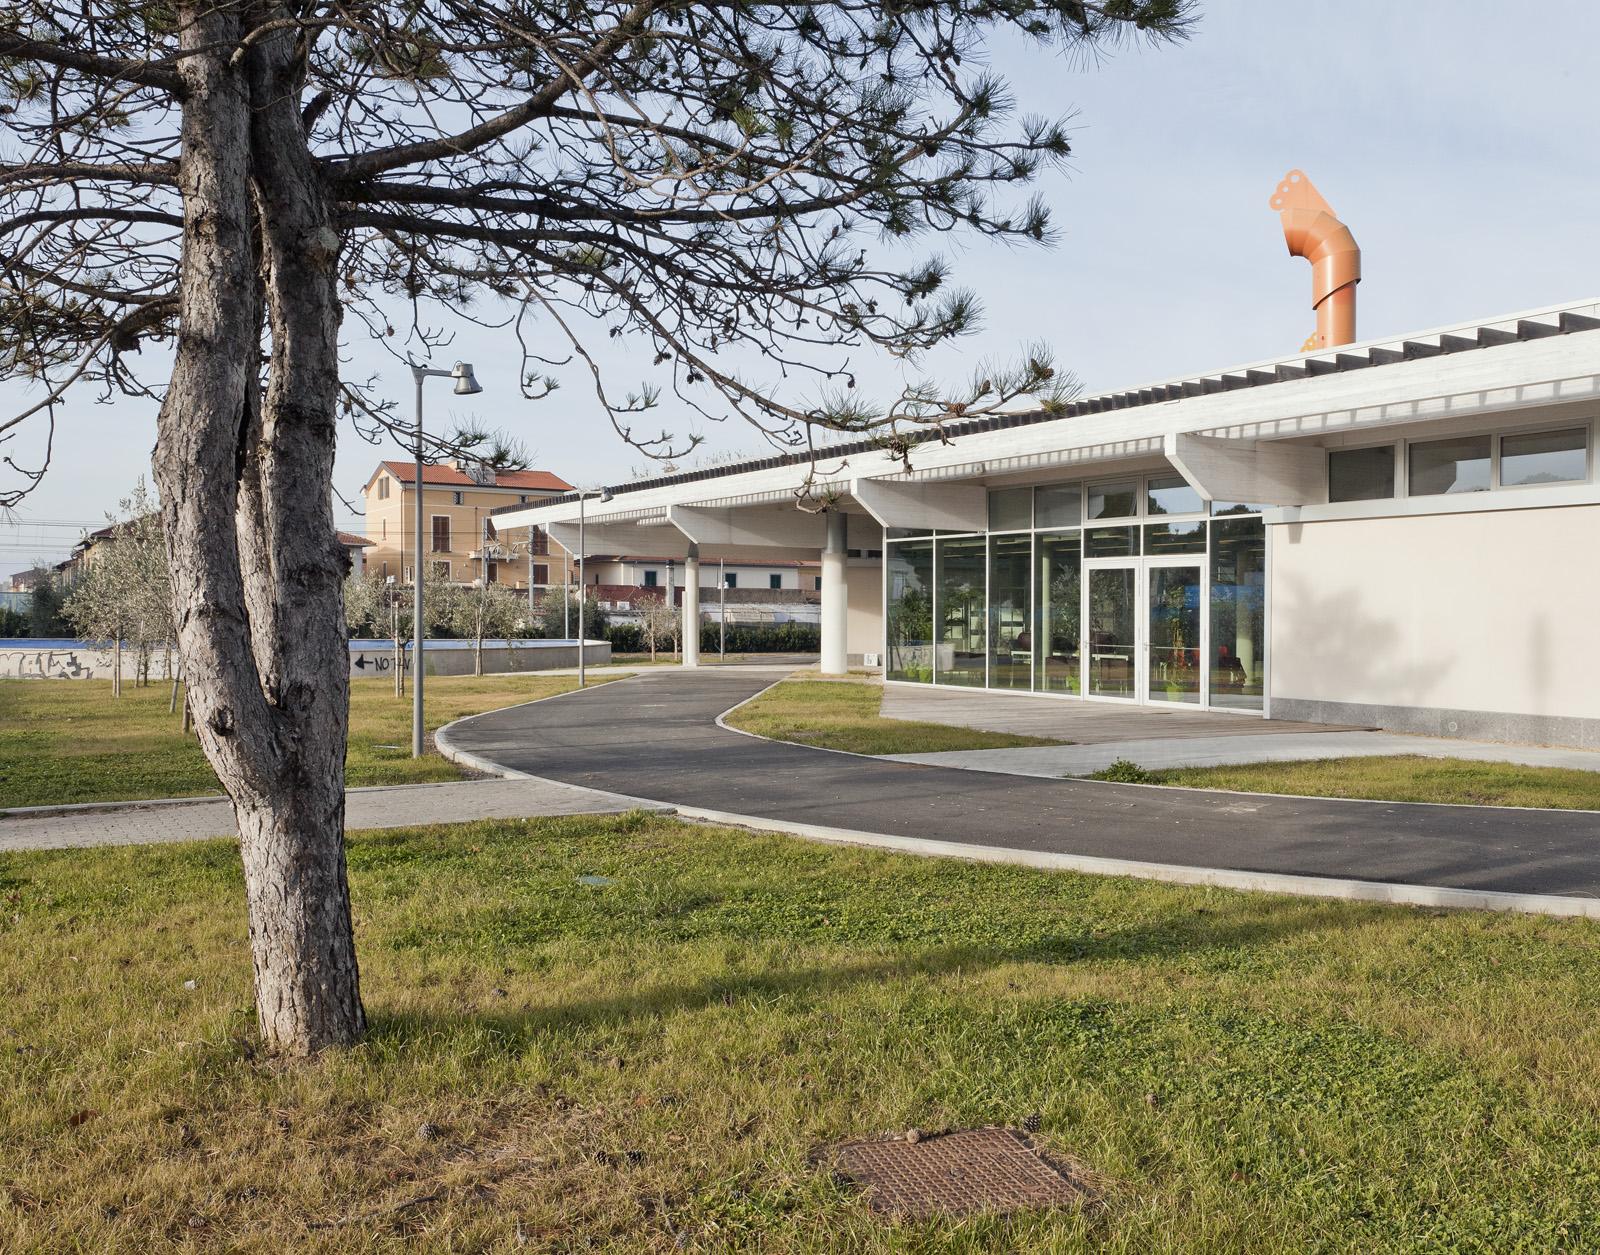 ROS, Nuova biblioteca civica, Rosignano Marittimo (LI)